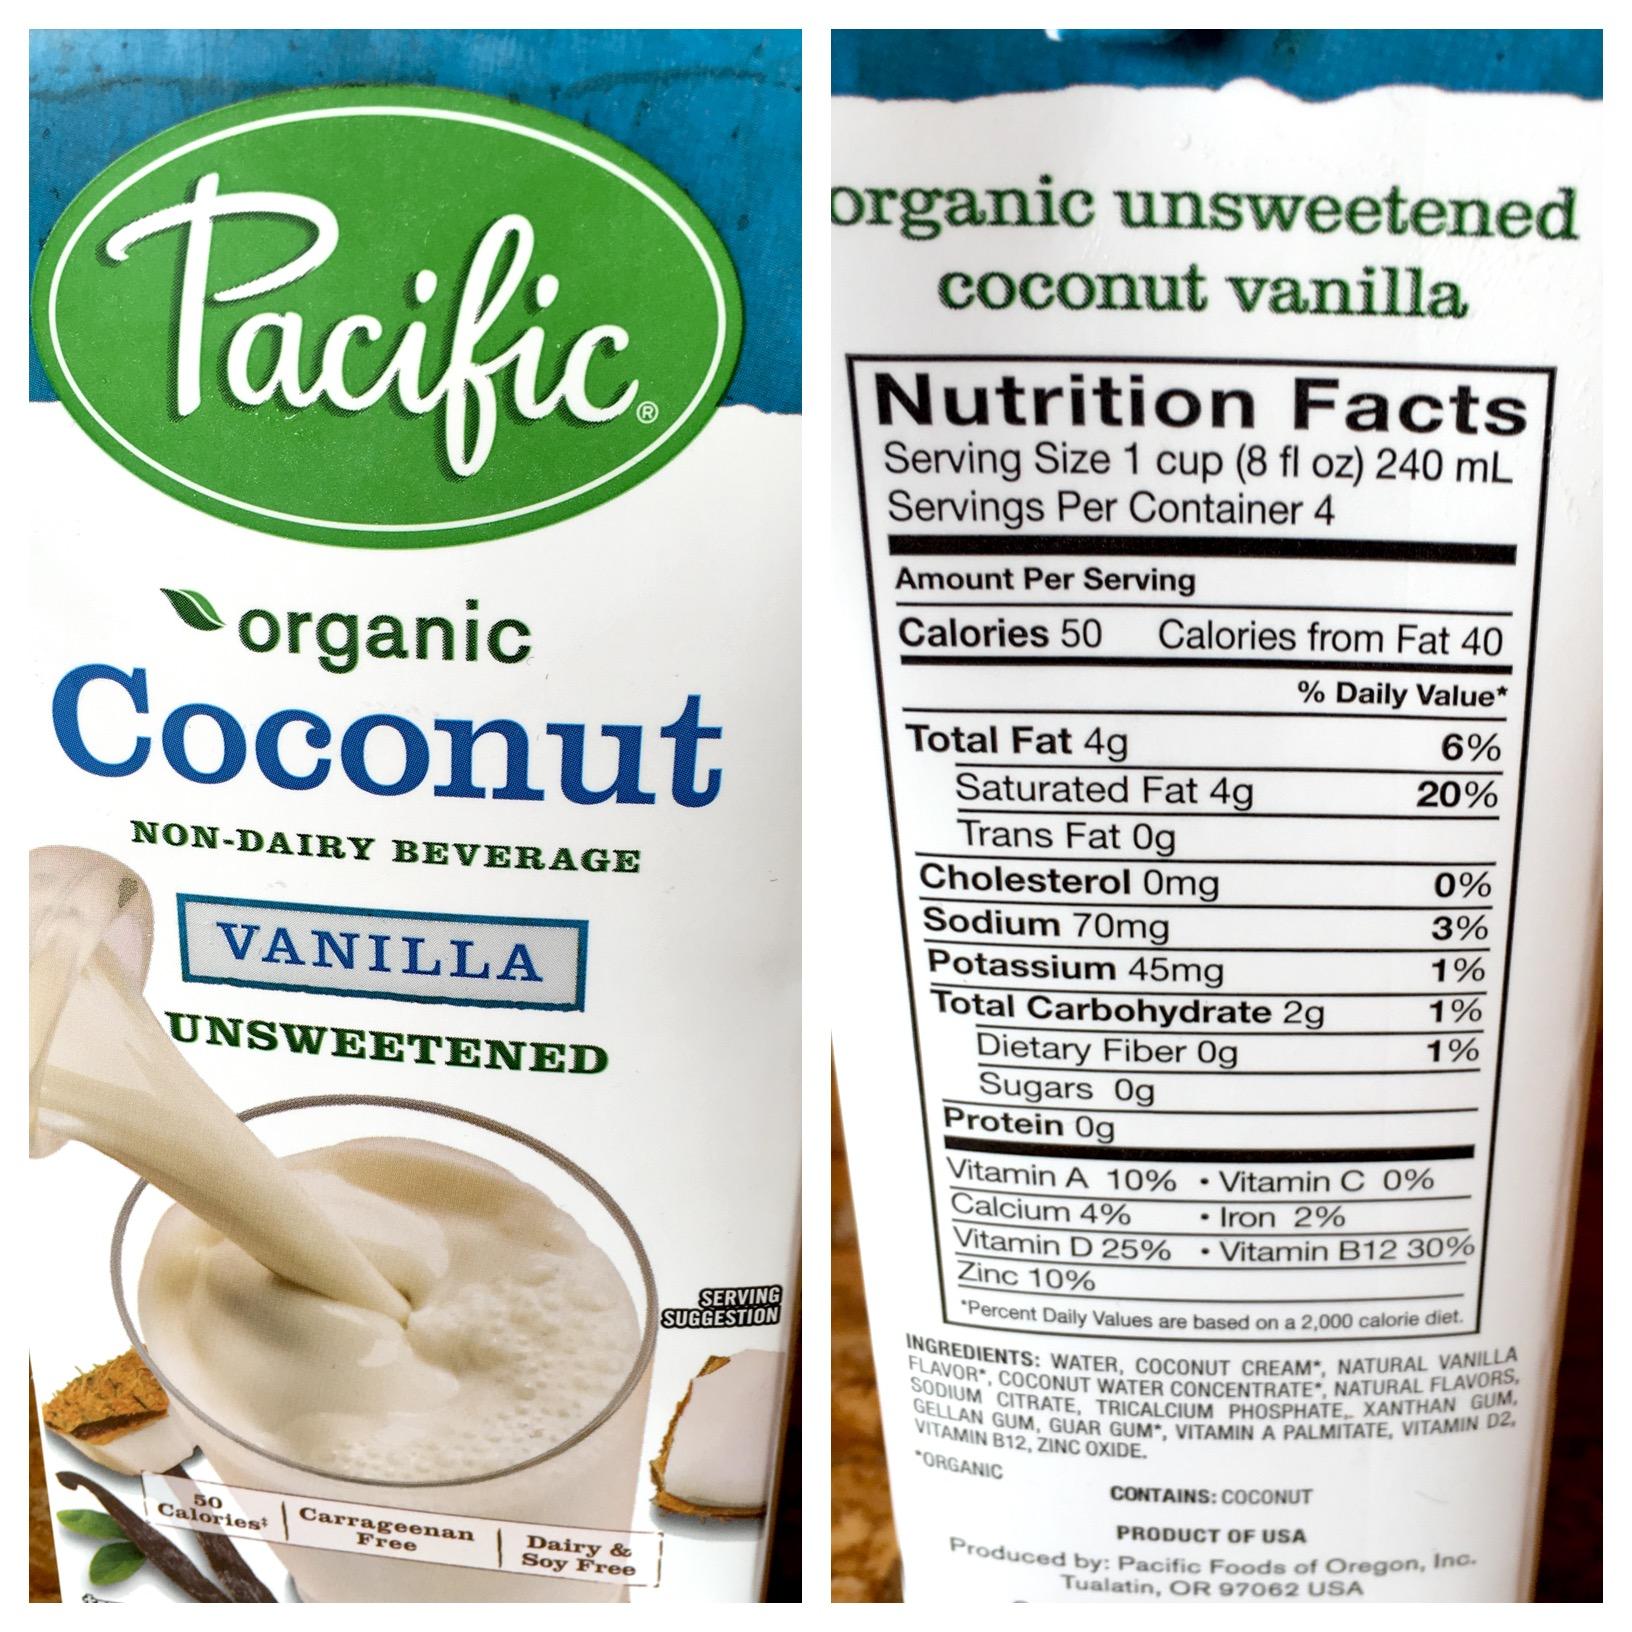 Pacific Organic Coconut Vanilla Unsweetened Milk: 50  CALORIES (40 FAT), 0G SUGAR, 0G PROTEIN, 70MG SODIUM, 2G   CARBS  , 30  % B12, 25% viT D